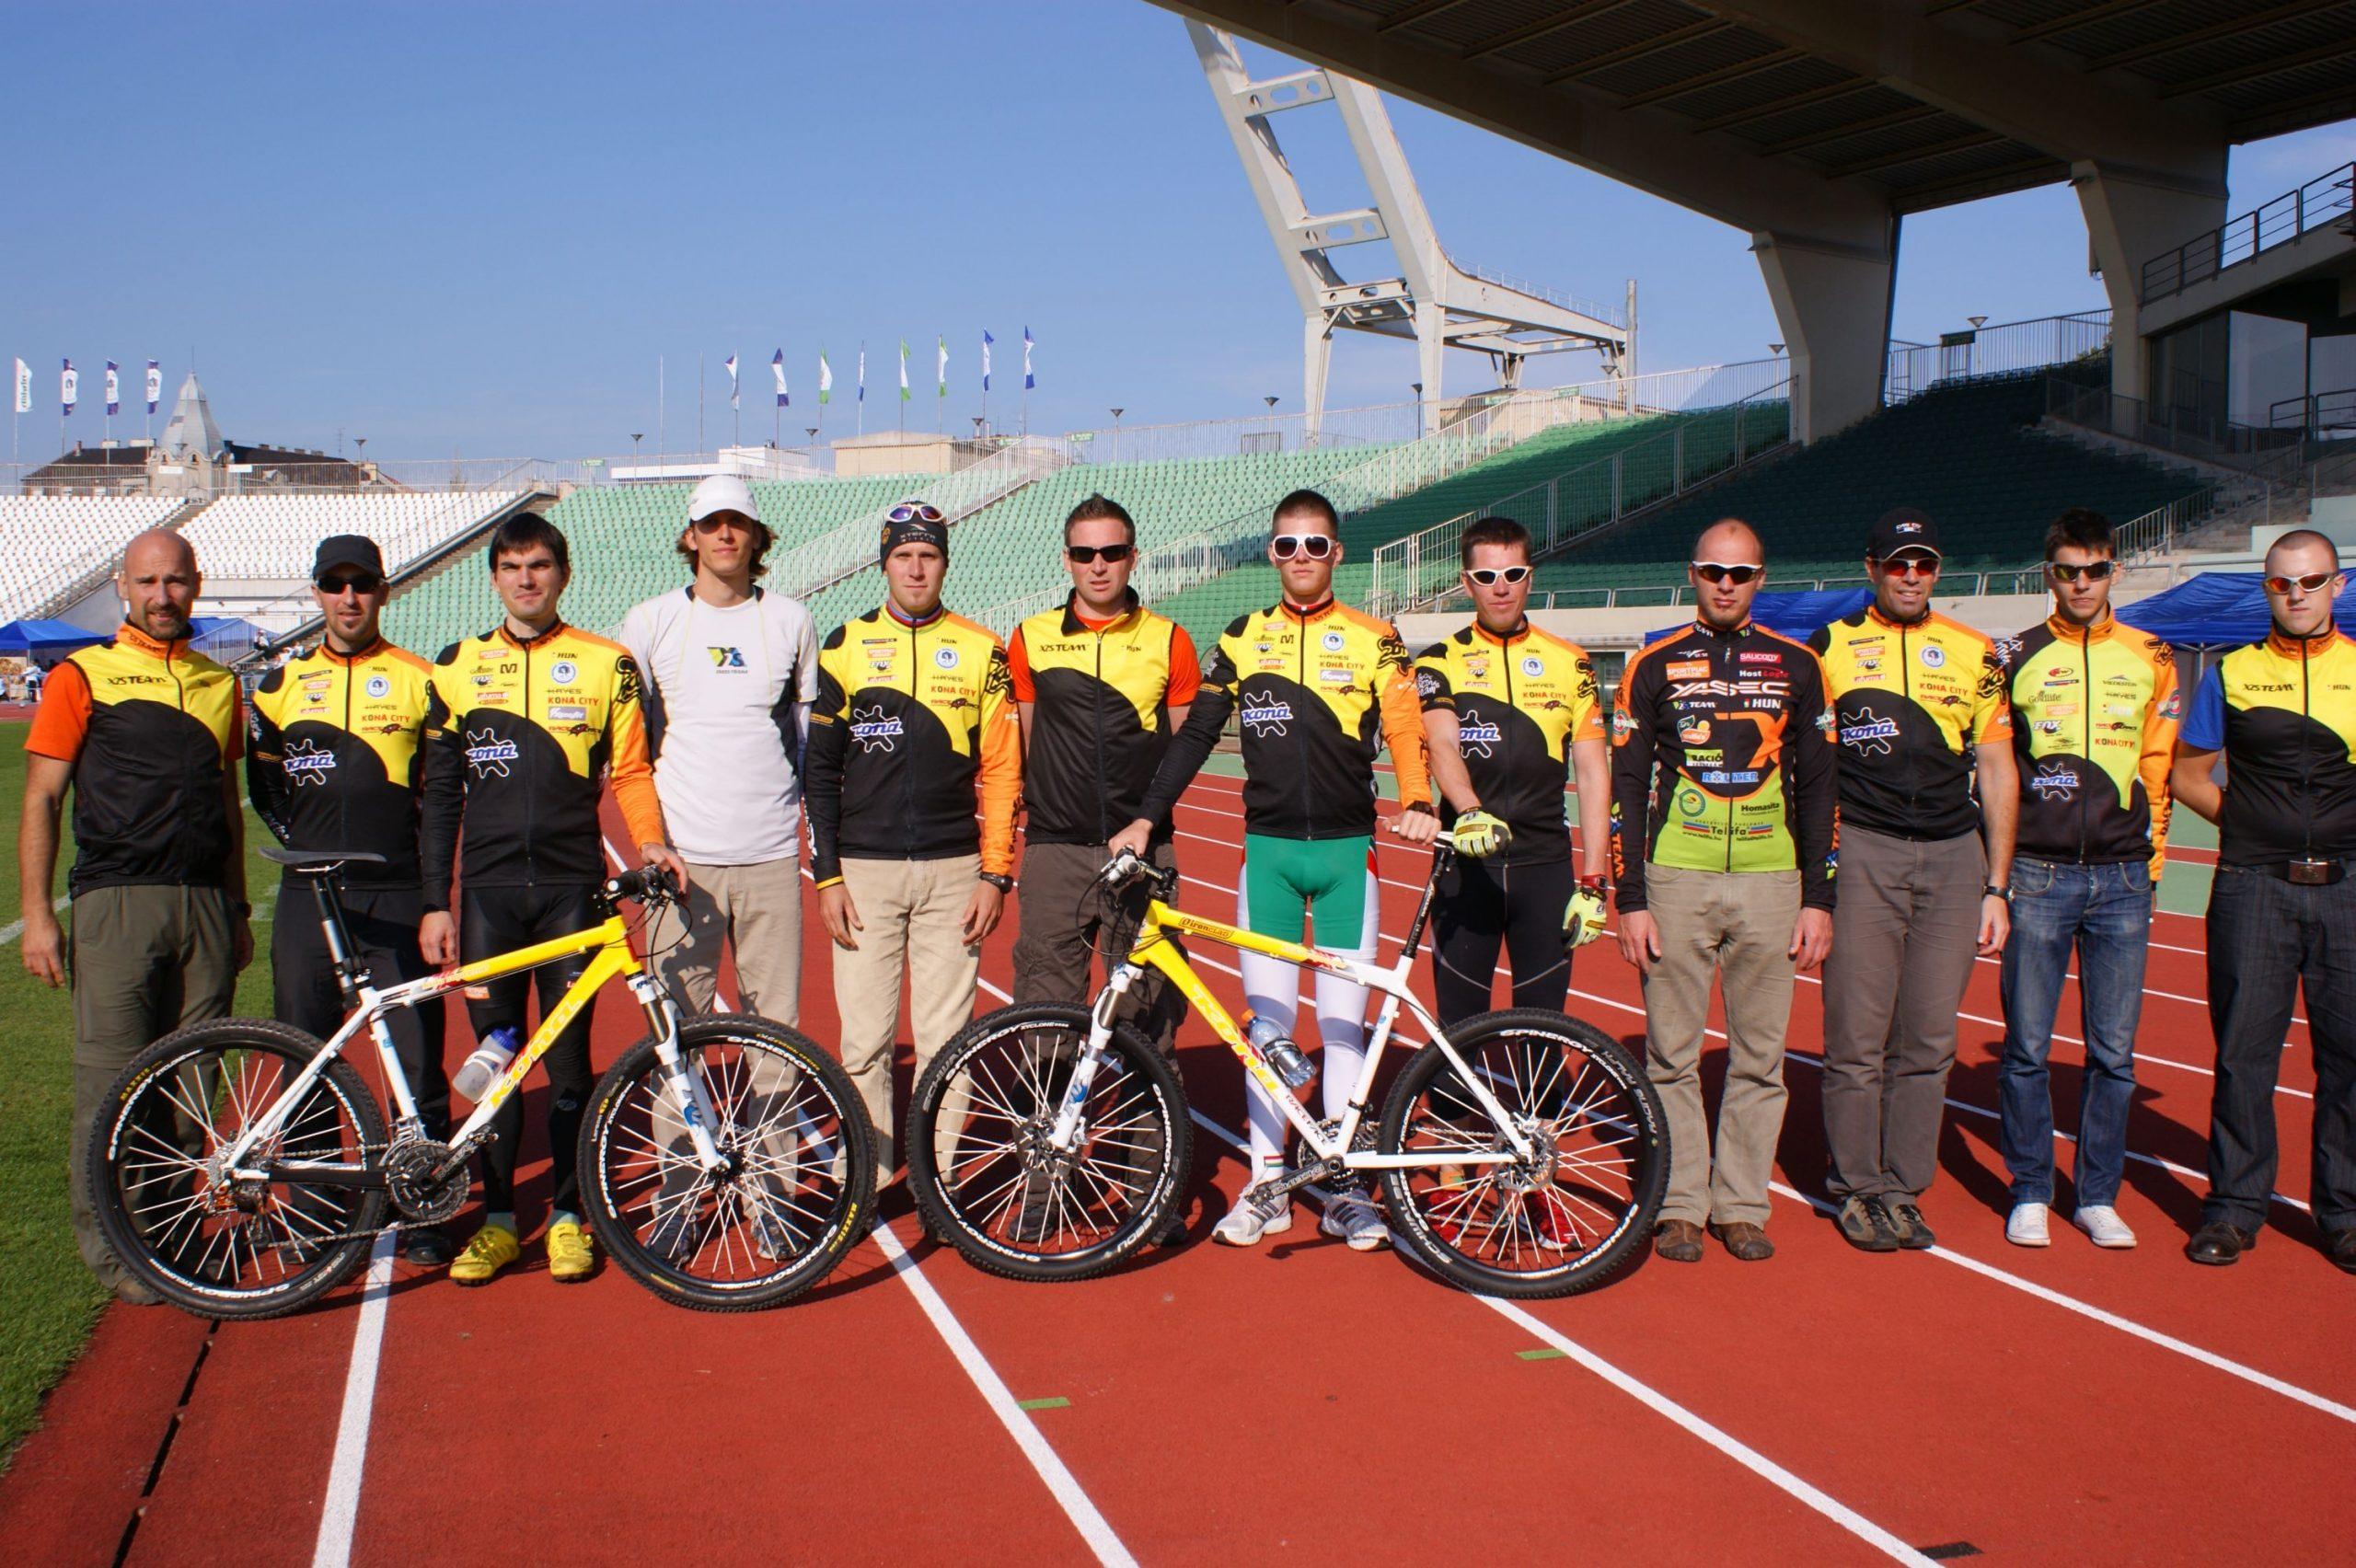 BM puskas stadion guiness rekord - x2s kona team